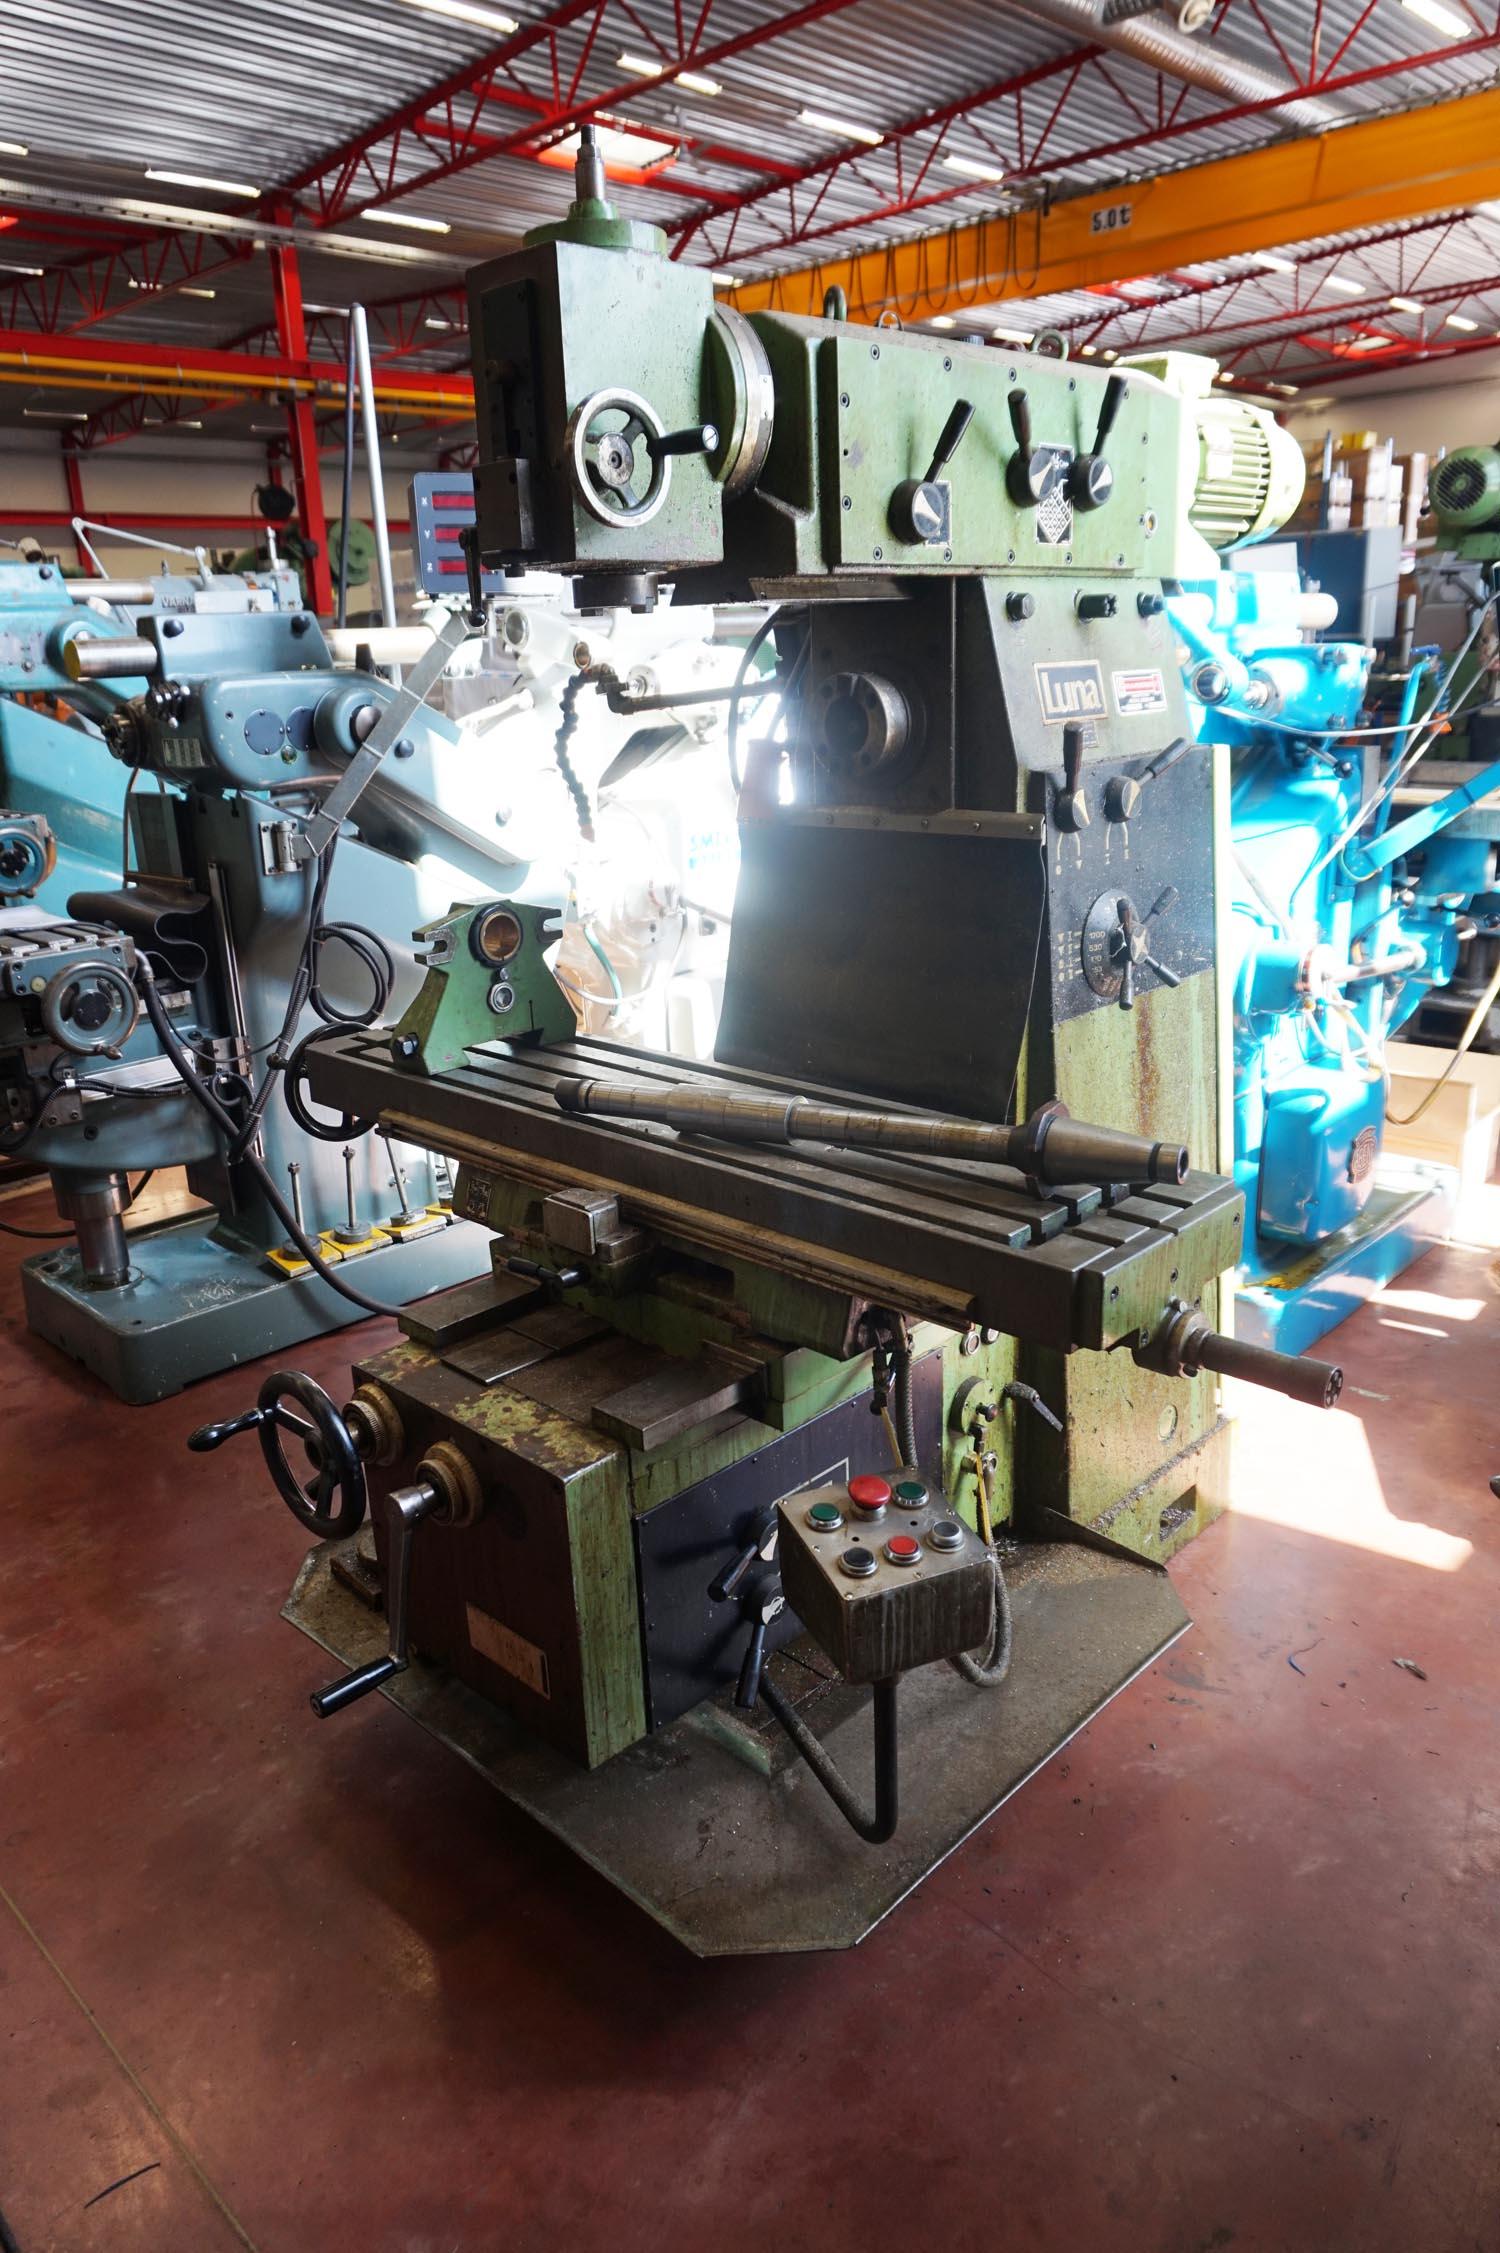 pedersen milling machine manual owners manual book u2022 rh userguidesearch today Mill Machine Co Vertical Mill Machine Components